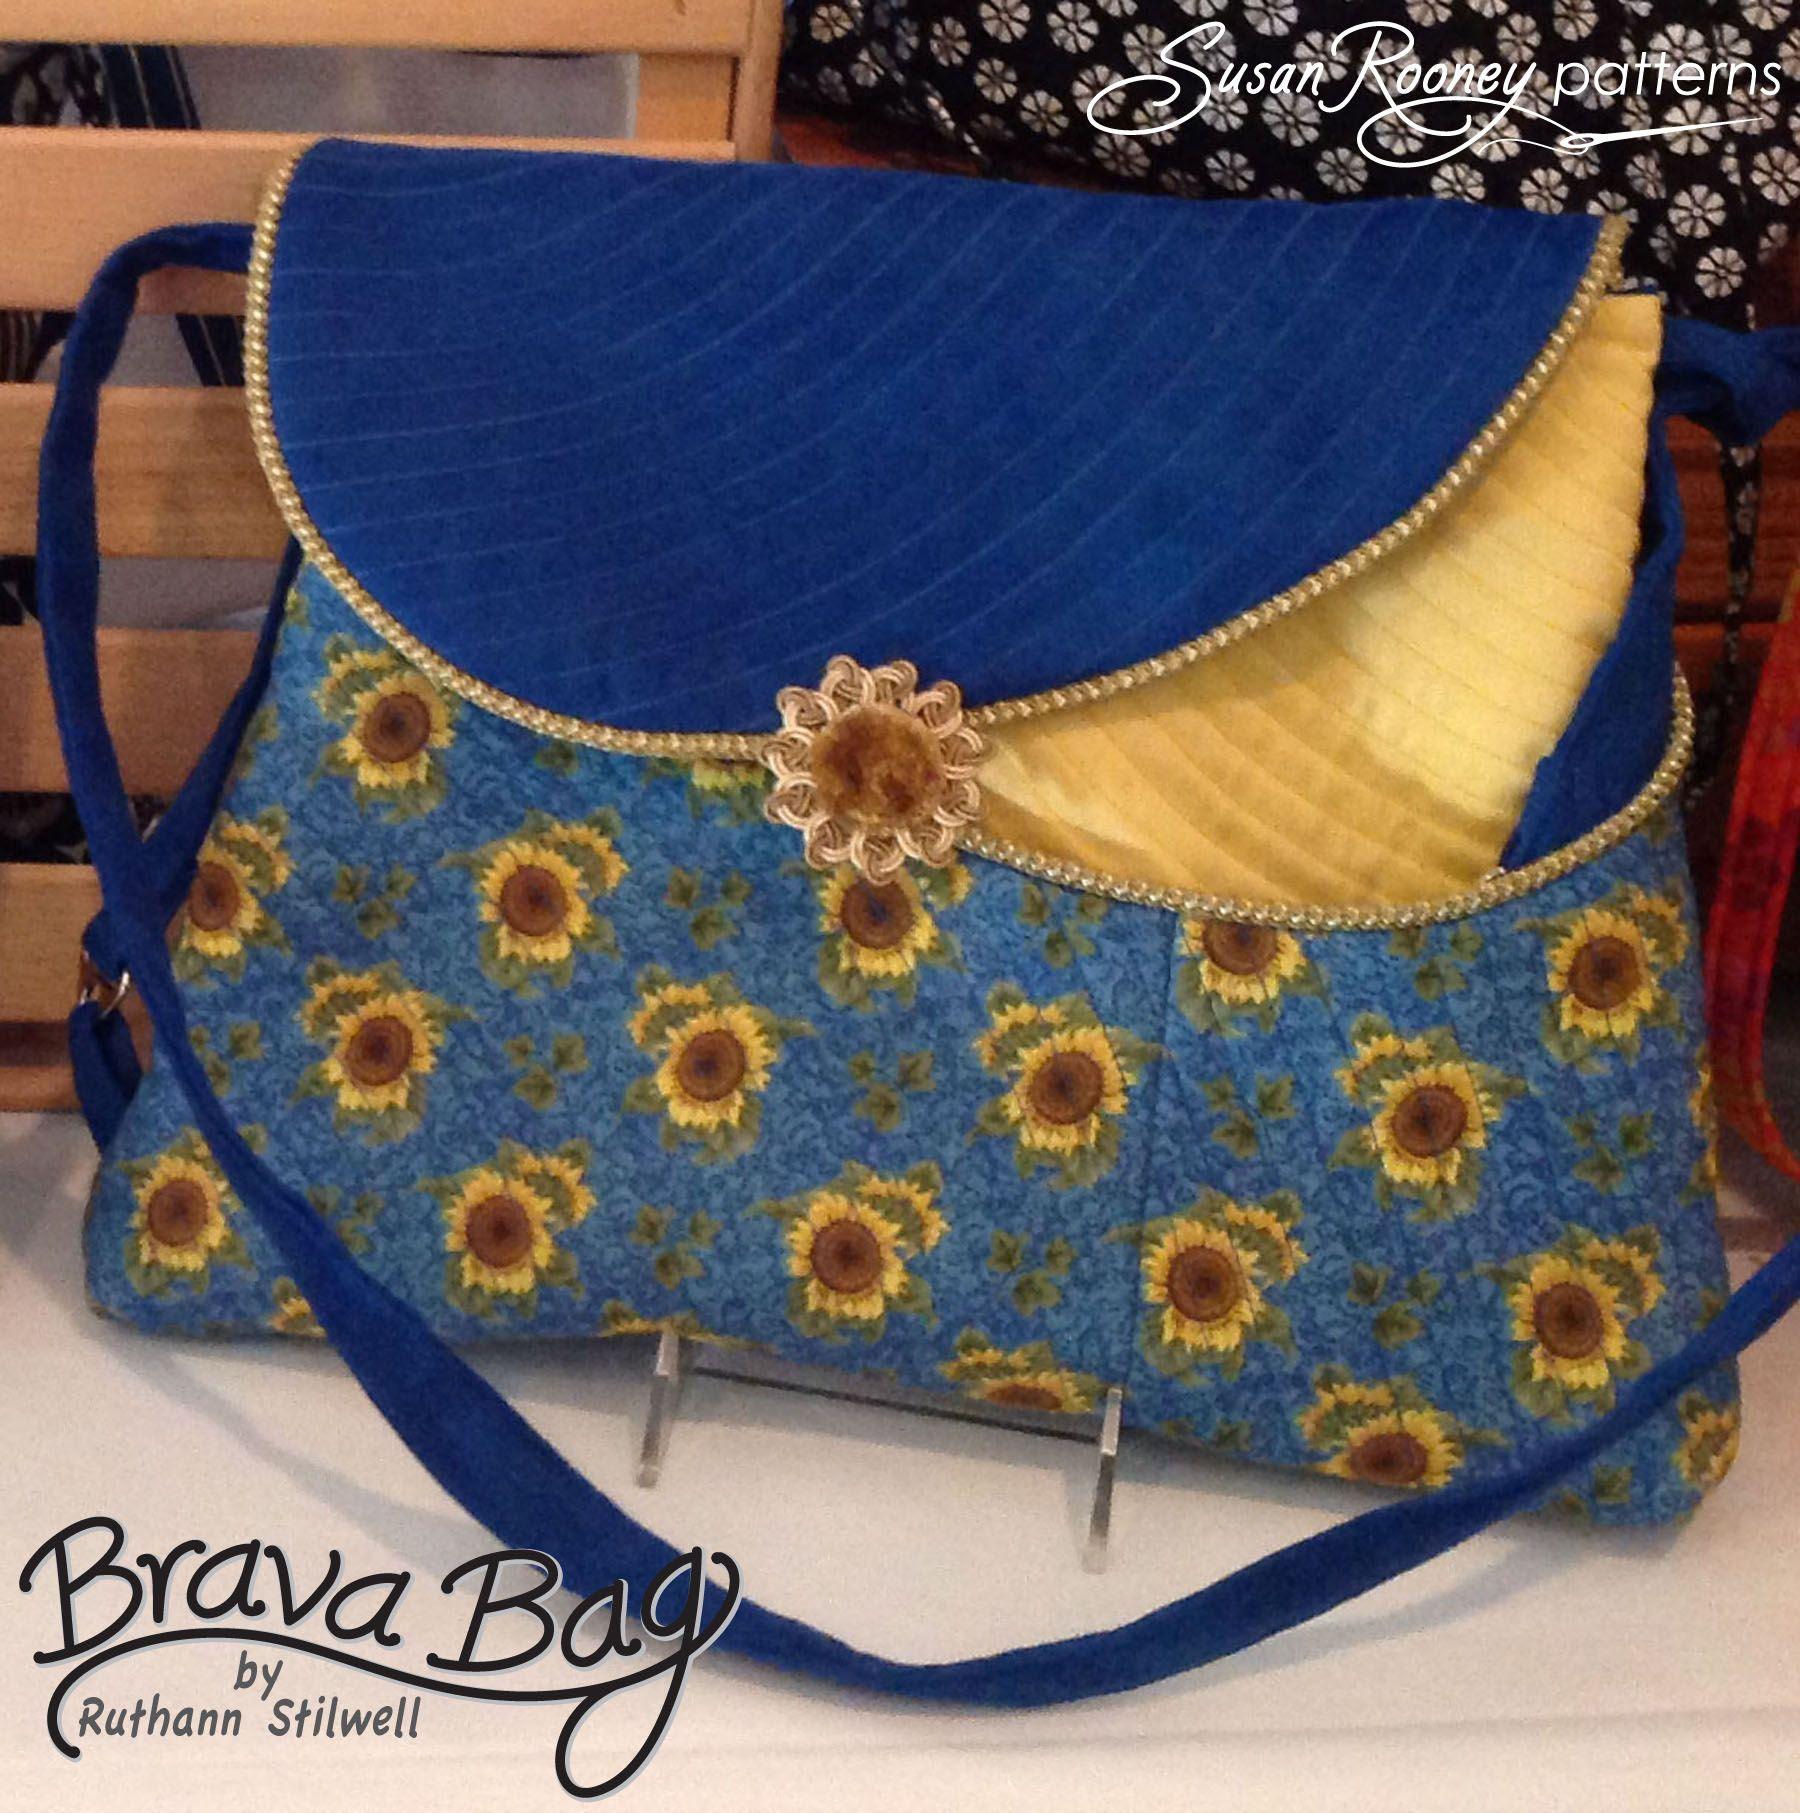 Susan Rooney Patterns Brava Bag Sunflowers